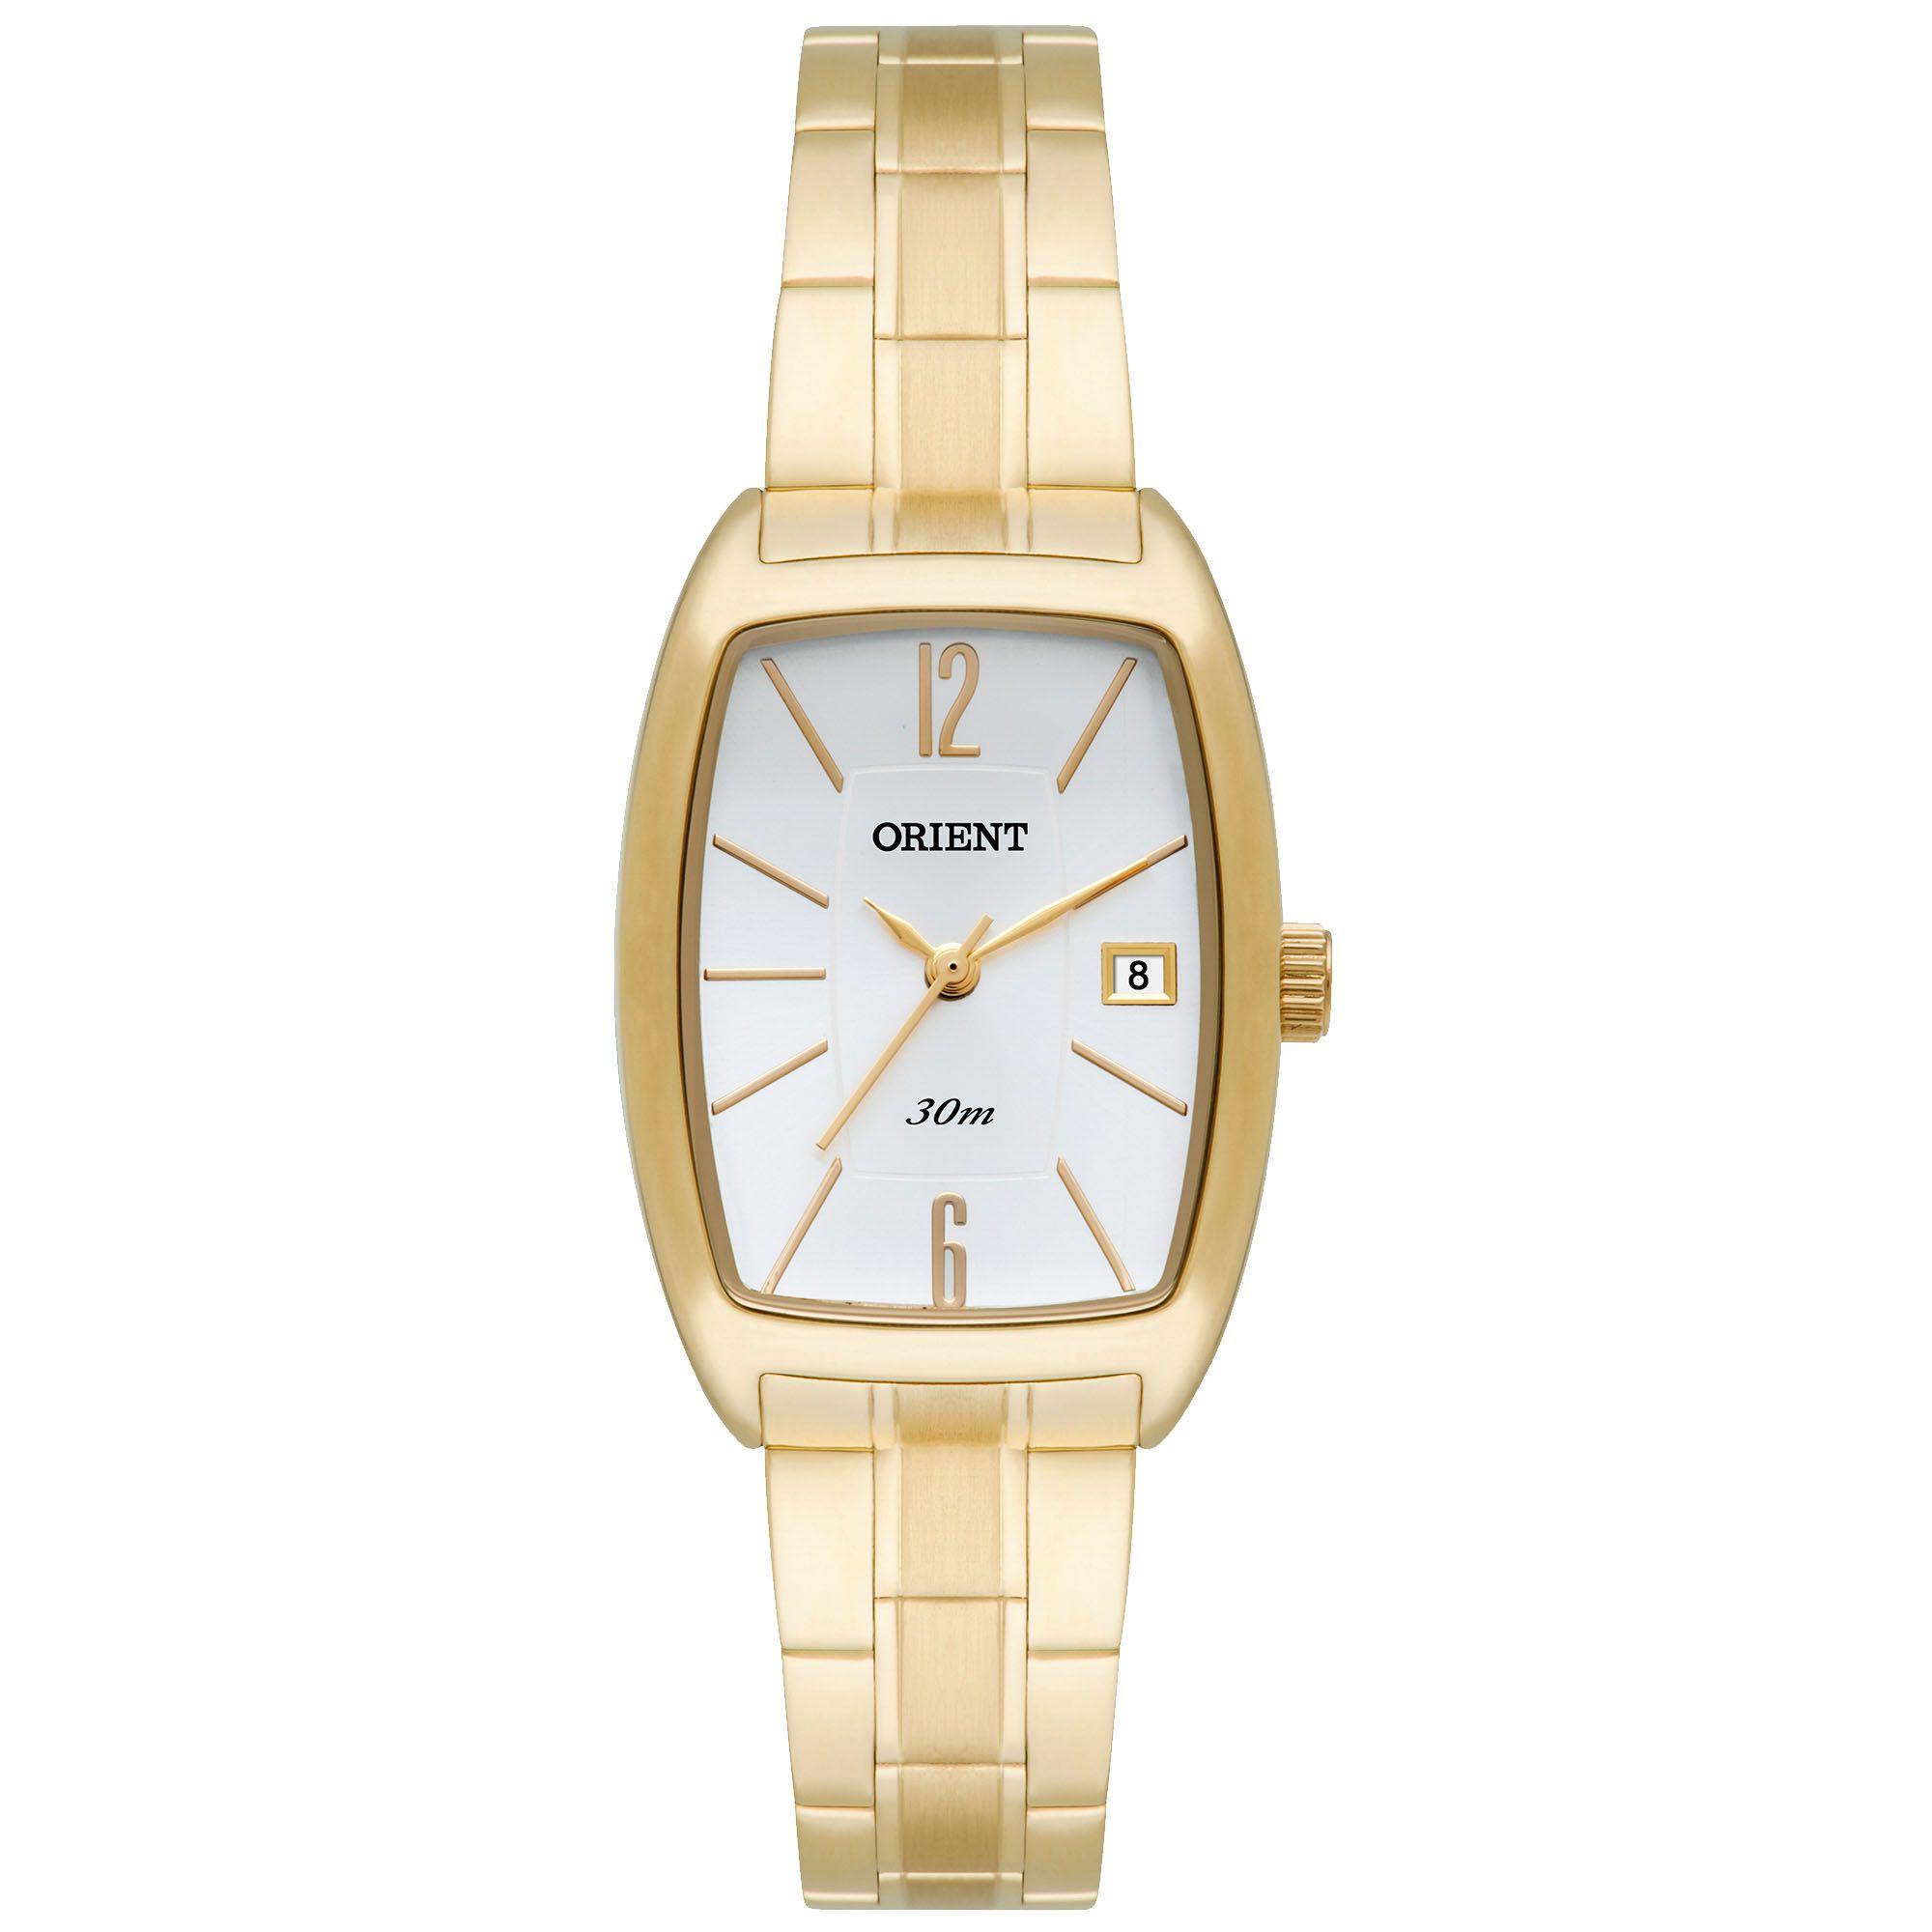 Relógio Feminino Orient LGSS1013 S2KX